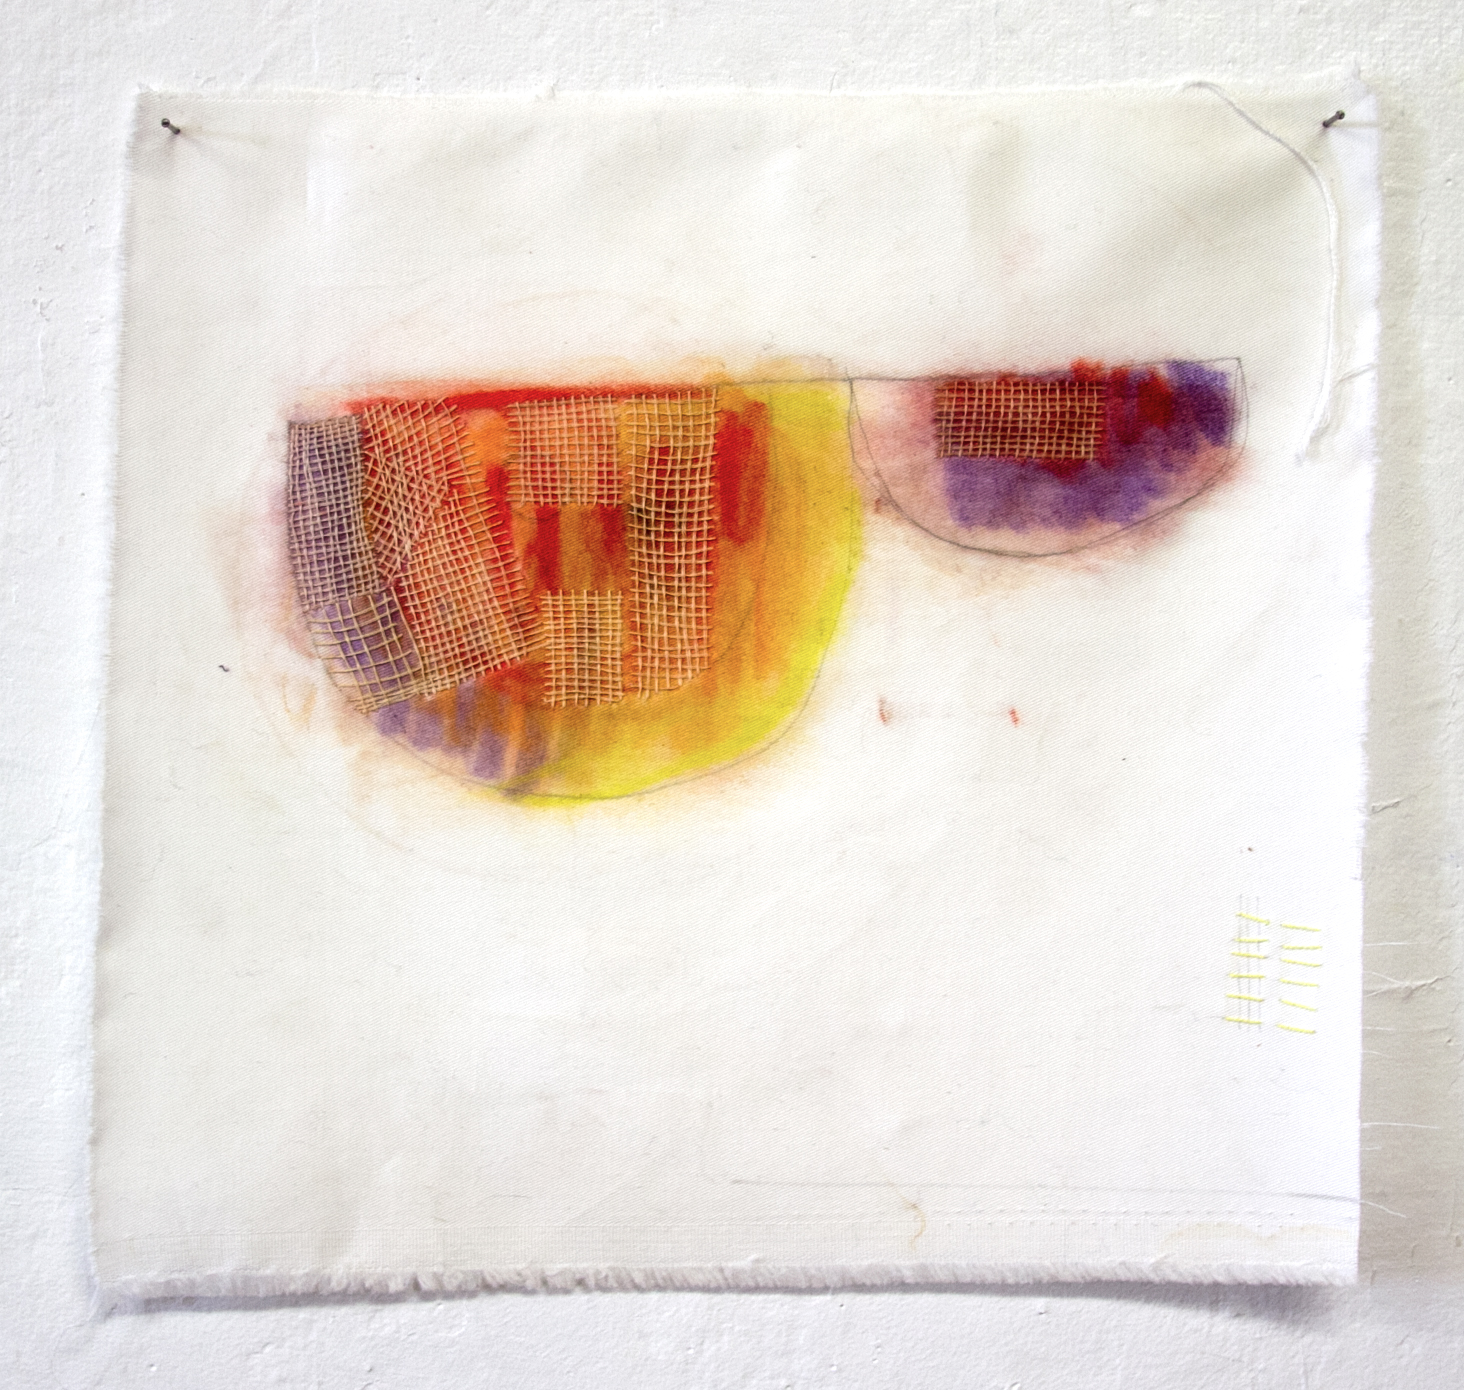 Untitled (2), 2014